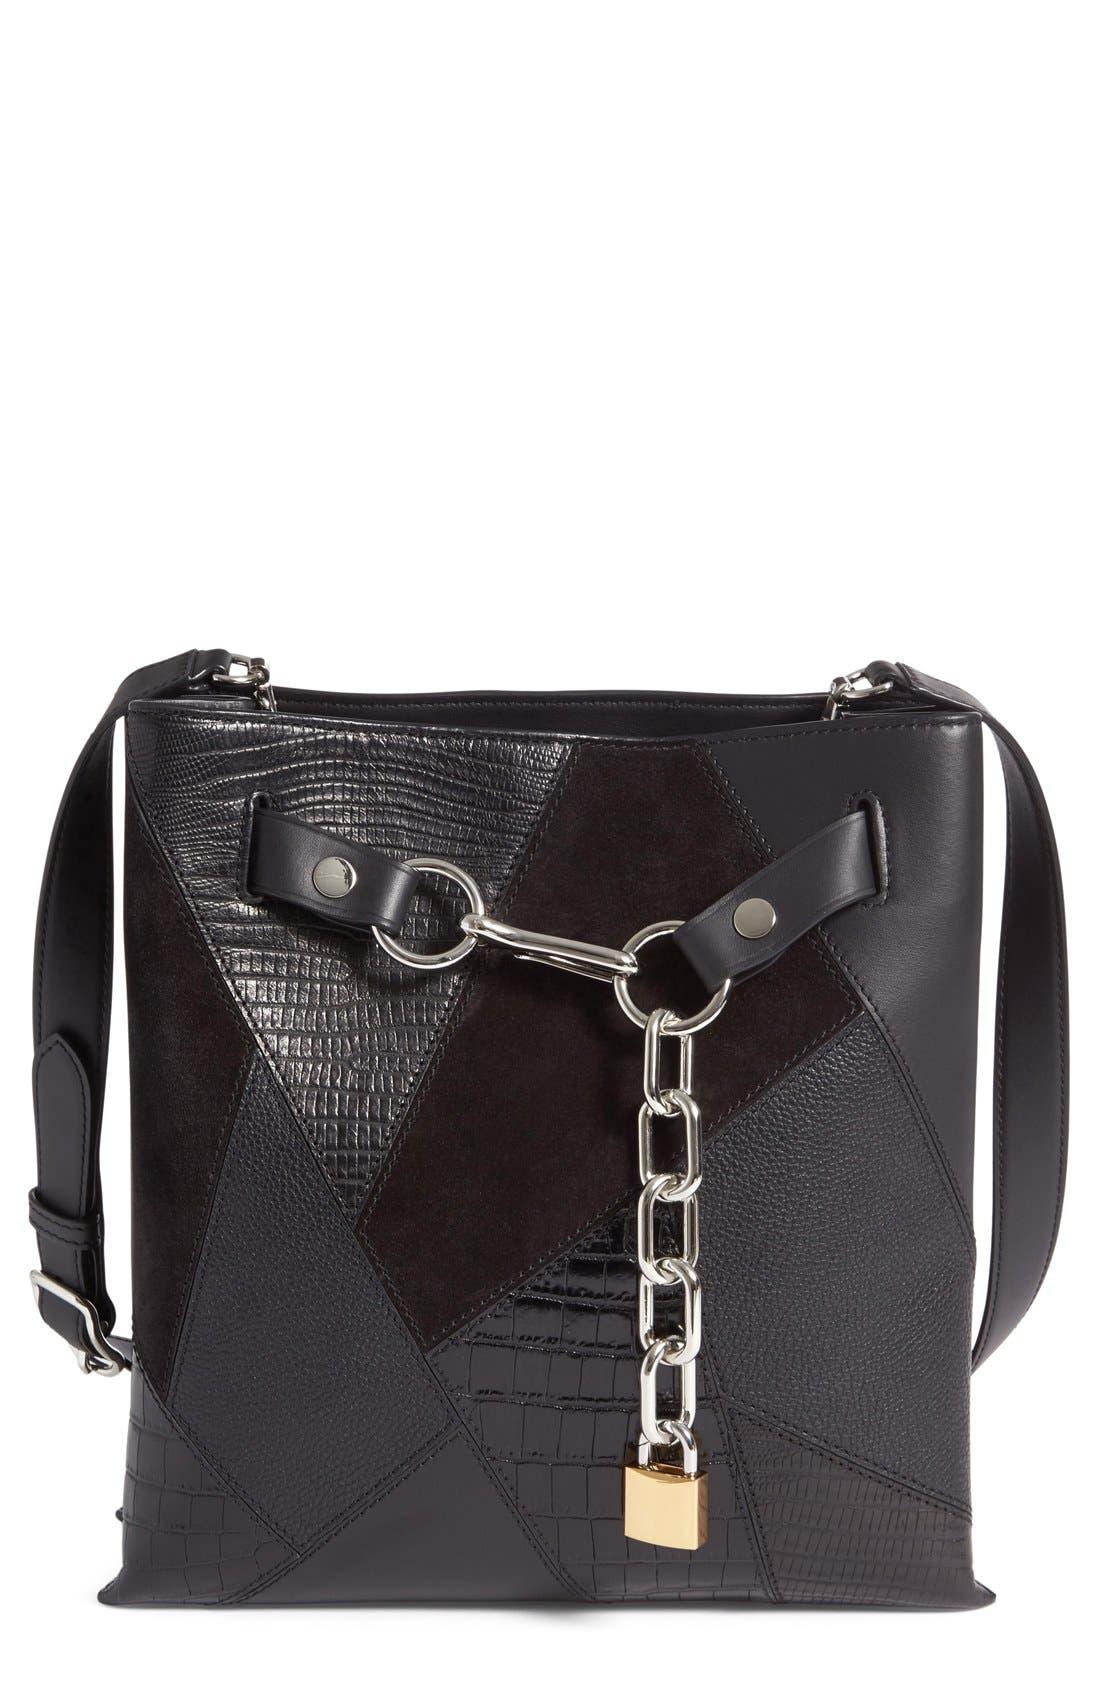 ALEXANDER WANG Attica Leather Shoulder Bag